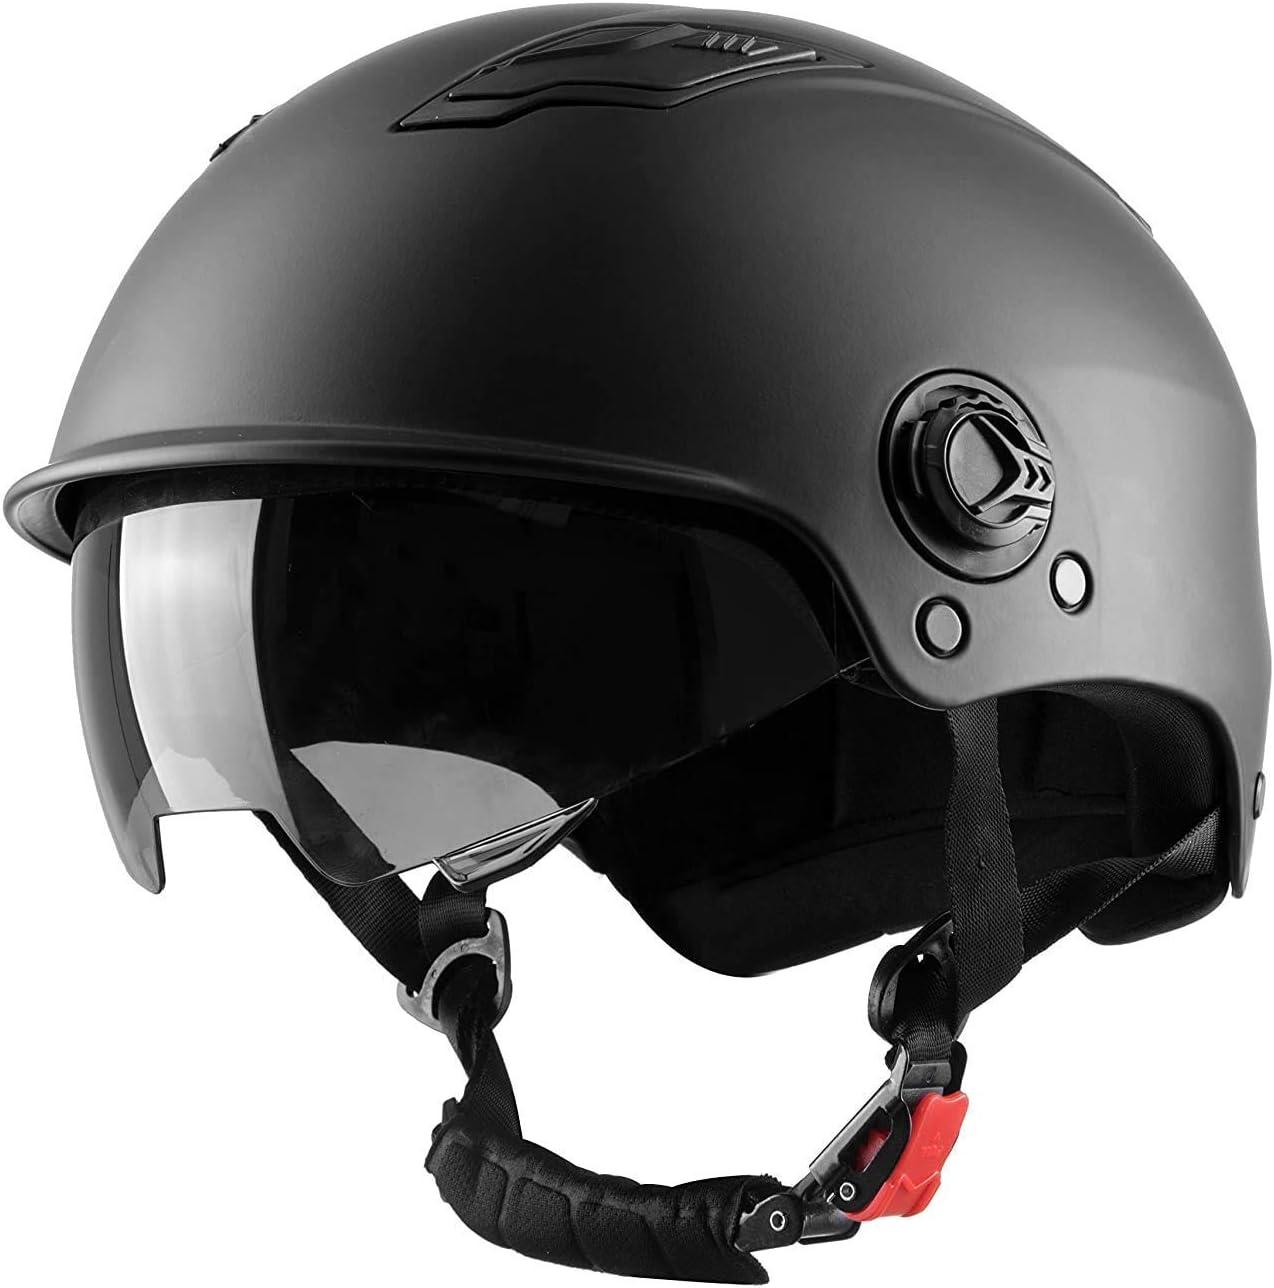 Westt Escape - Casco de Patinete Eléctrico con Visera - Casco Multiuso Negro Mate para Monopatín, Bicicleta y Patinete